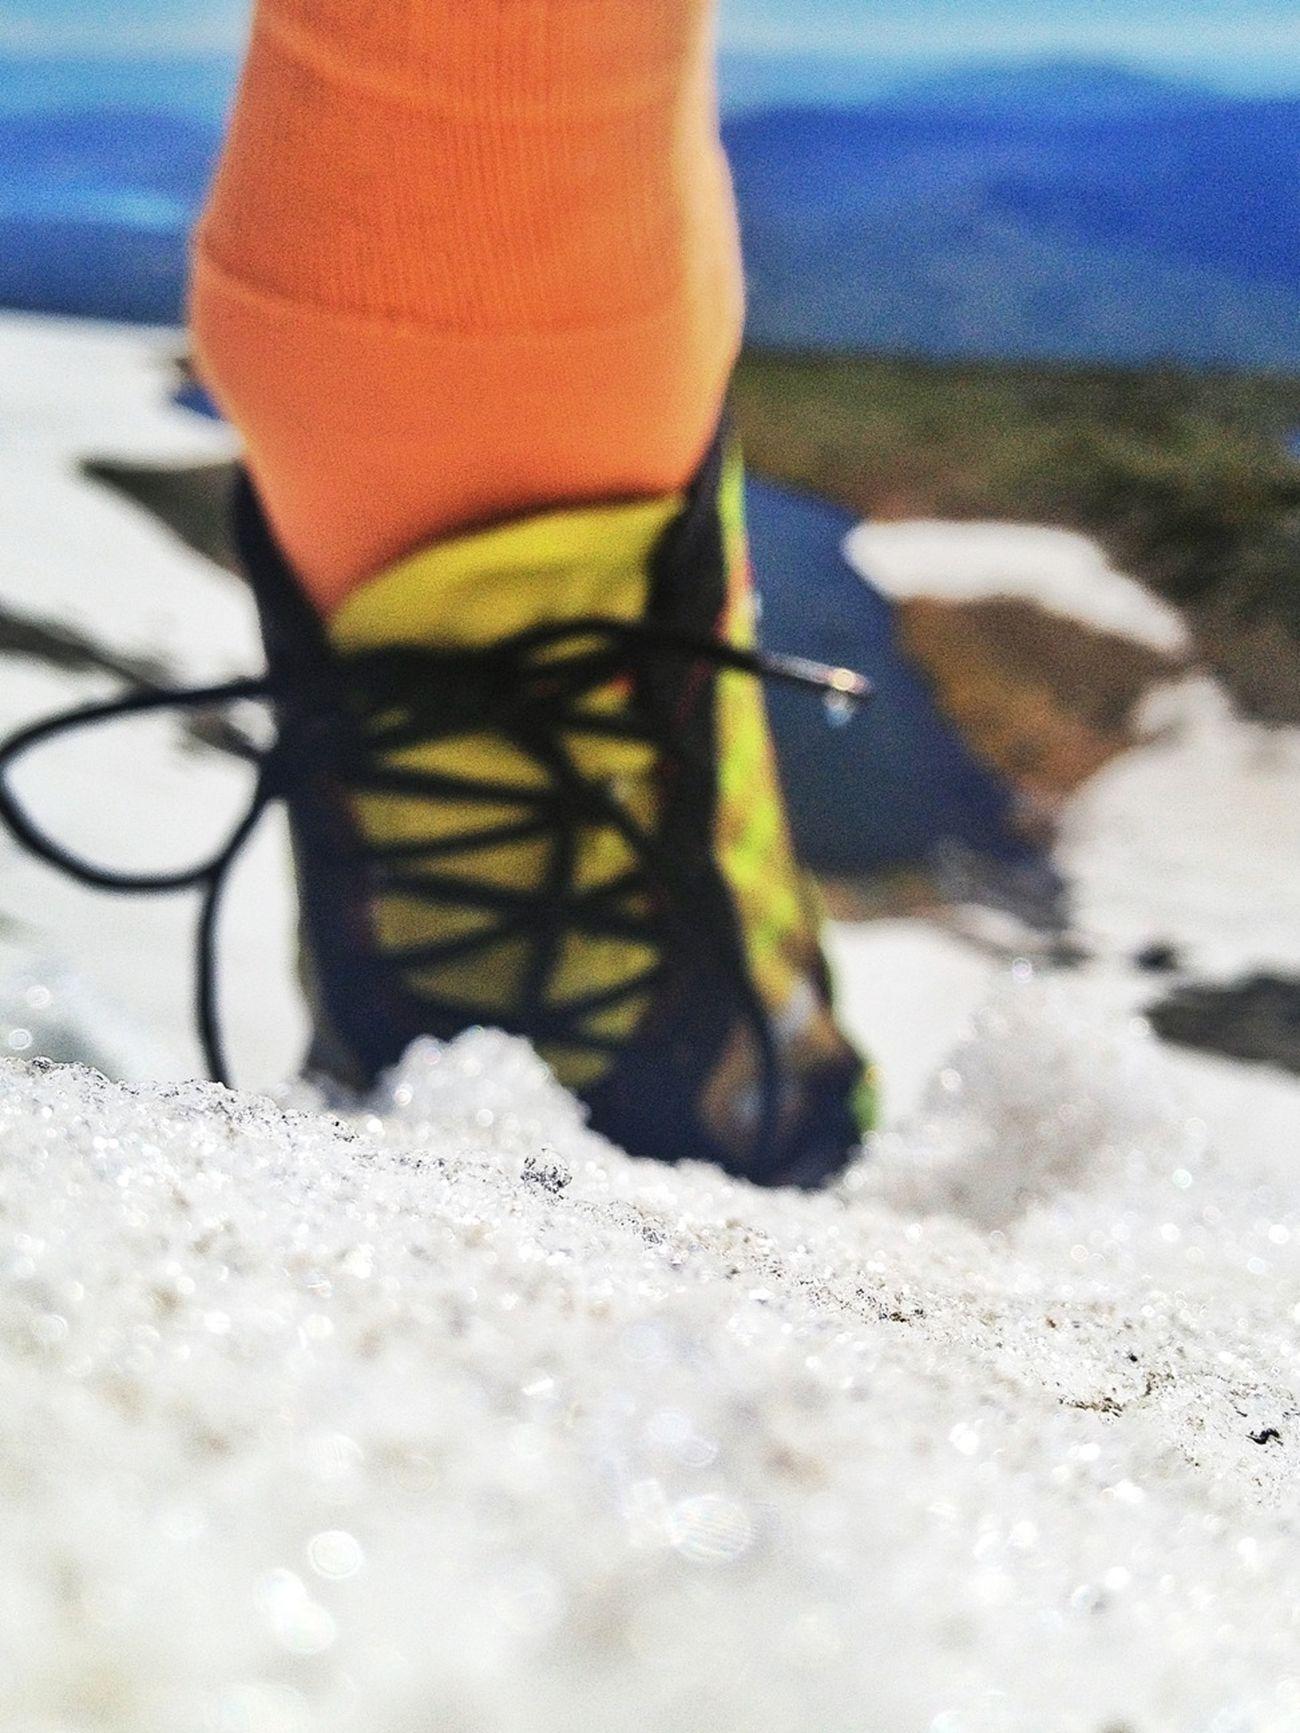 Detalles #trailrunning #peñalara #training #gasss #dynafit #felineghost #mountain #ilovemountains #spring #primavera #SuuntoAmbitions #Dynafitfinde